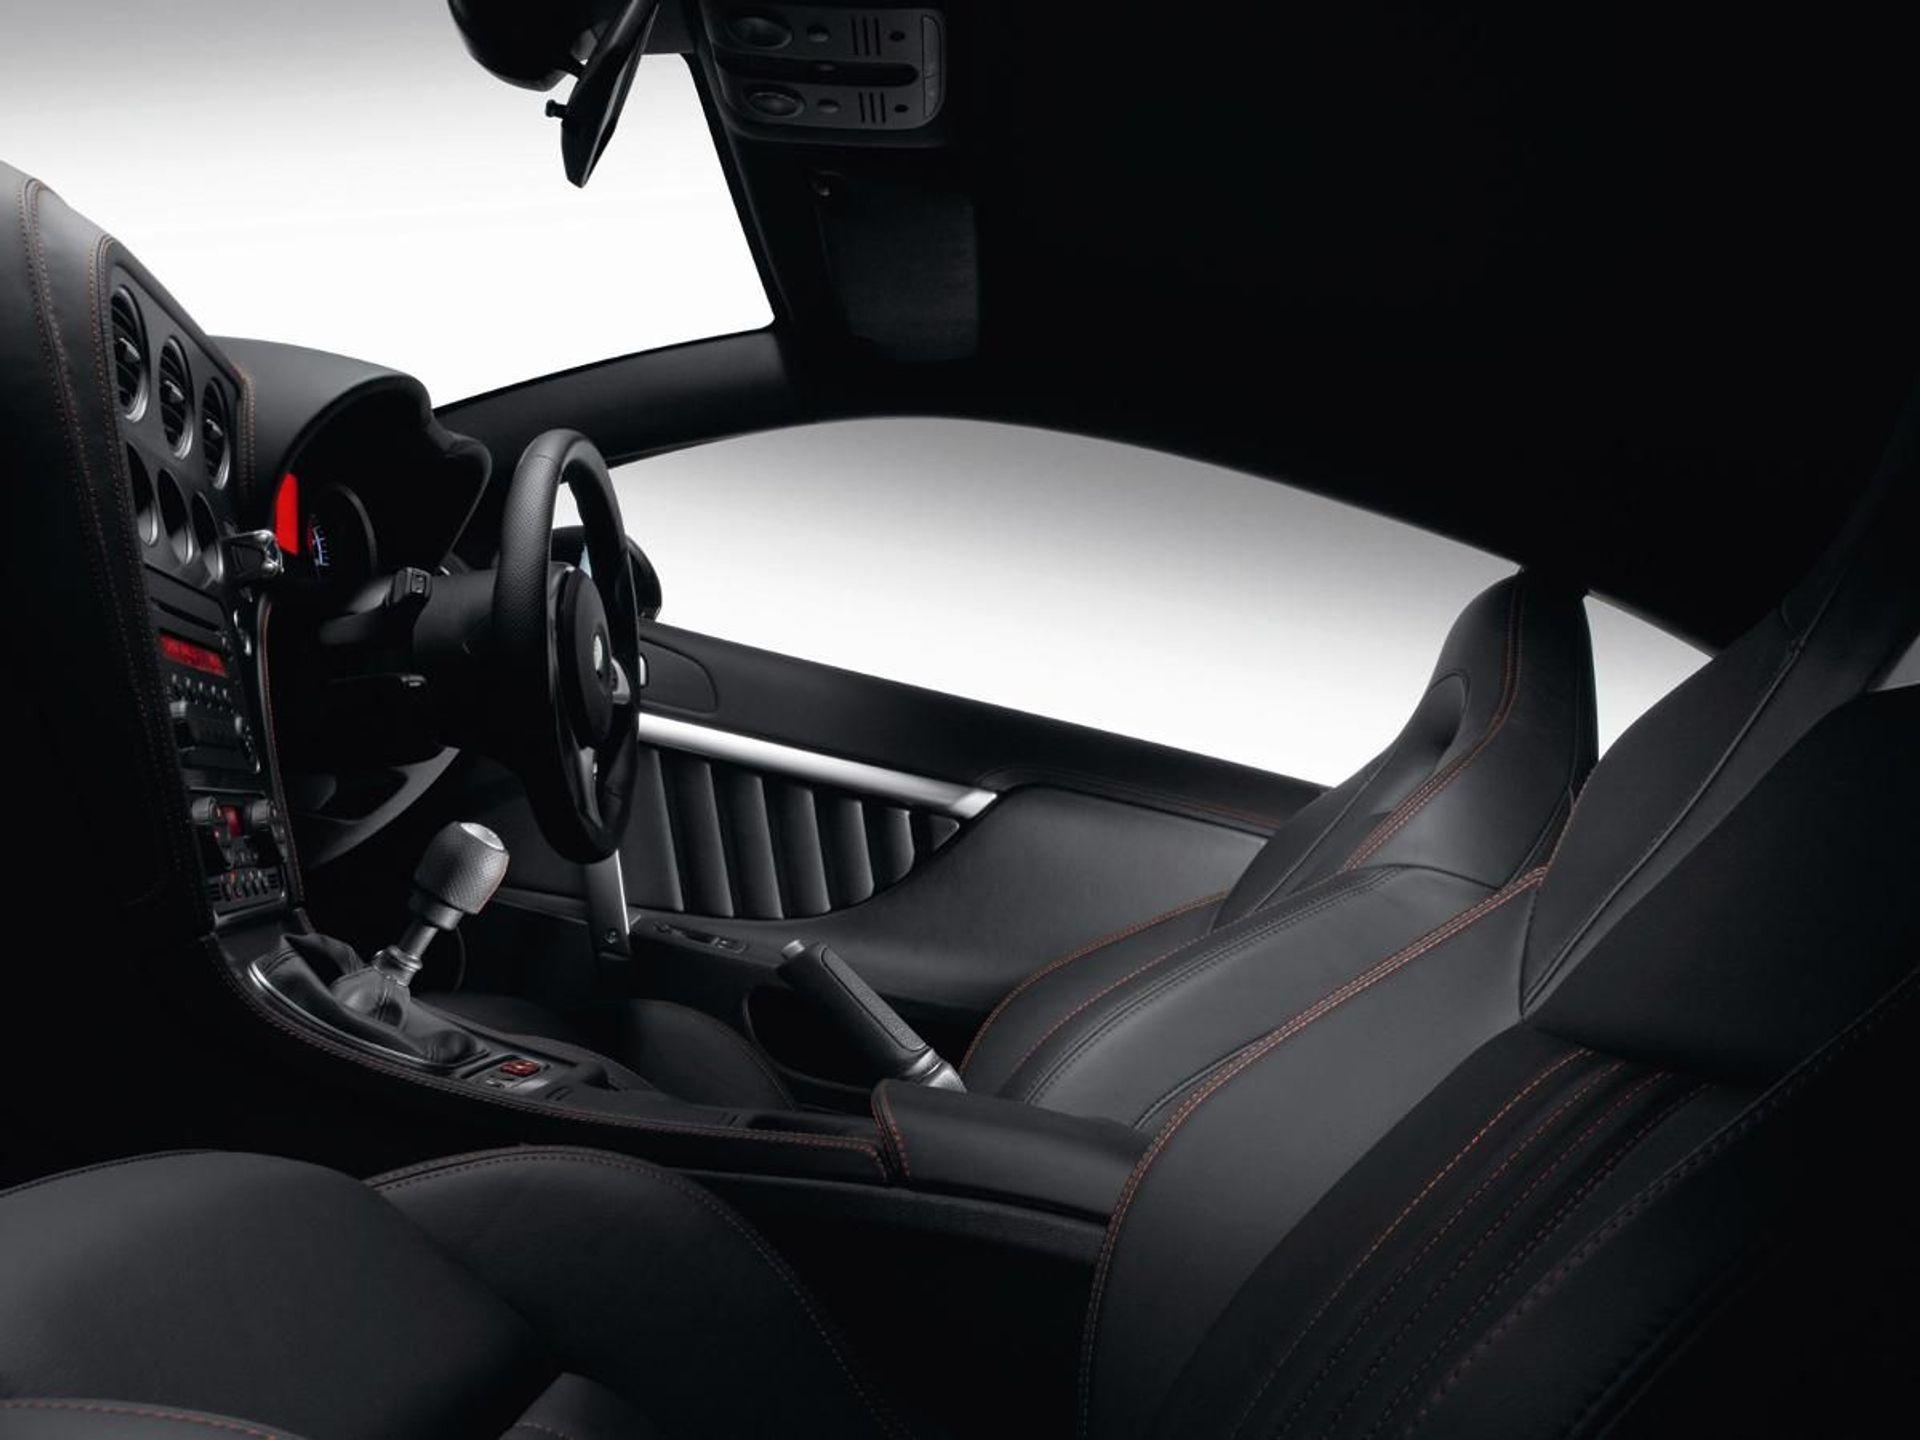 Alfa Romeo Brera SV image